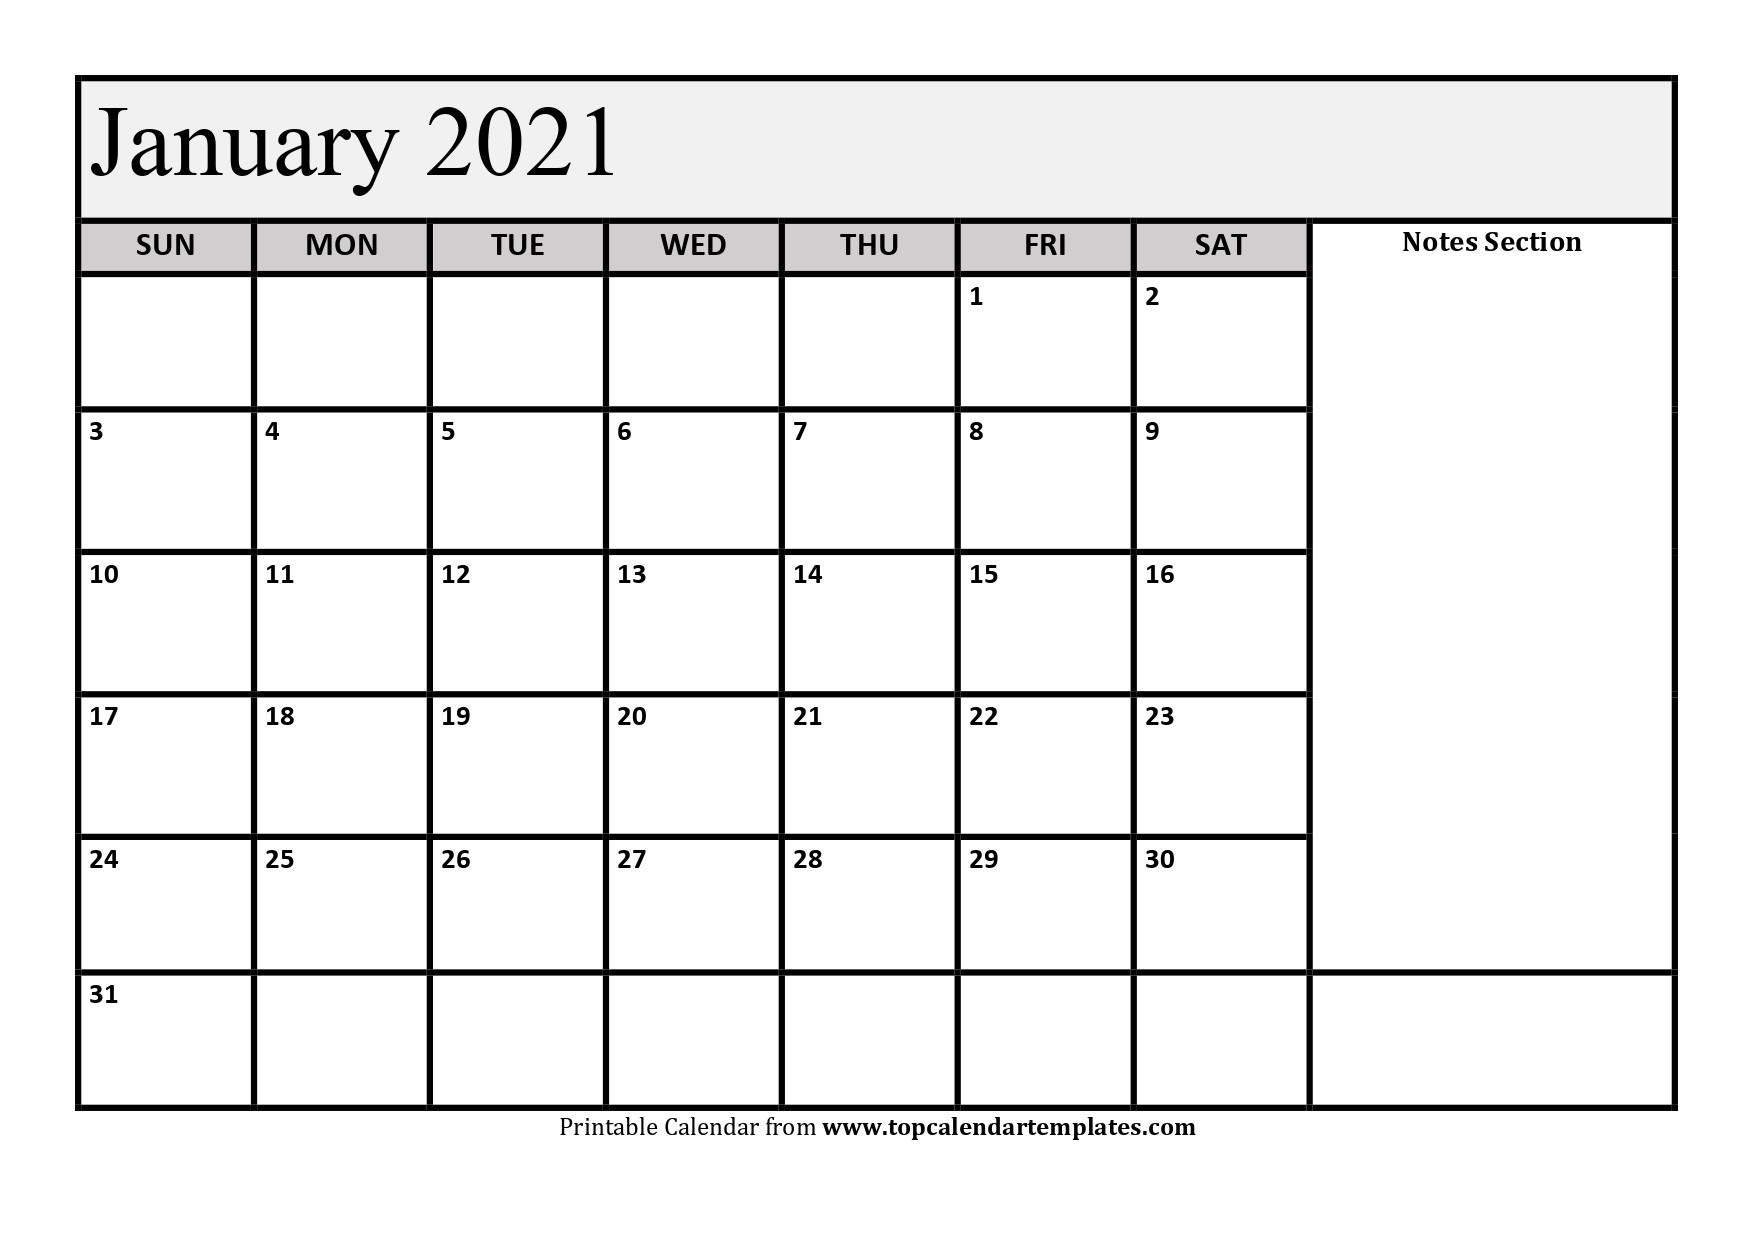 Free January 2021 Calendar Printable - Monthly Template-Free Printable Calendar 2021 Monthly